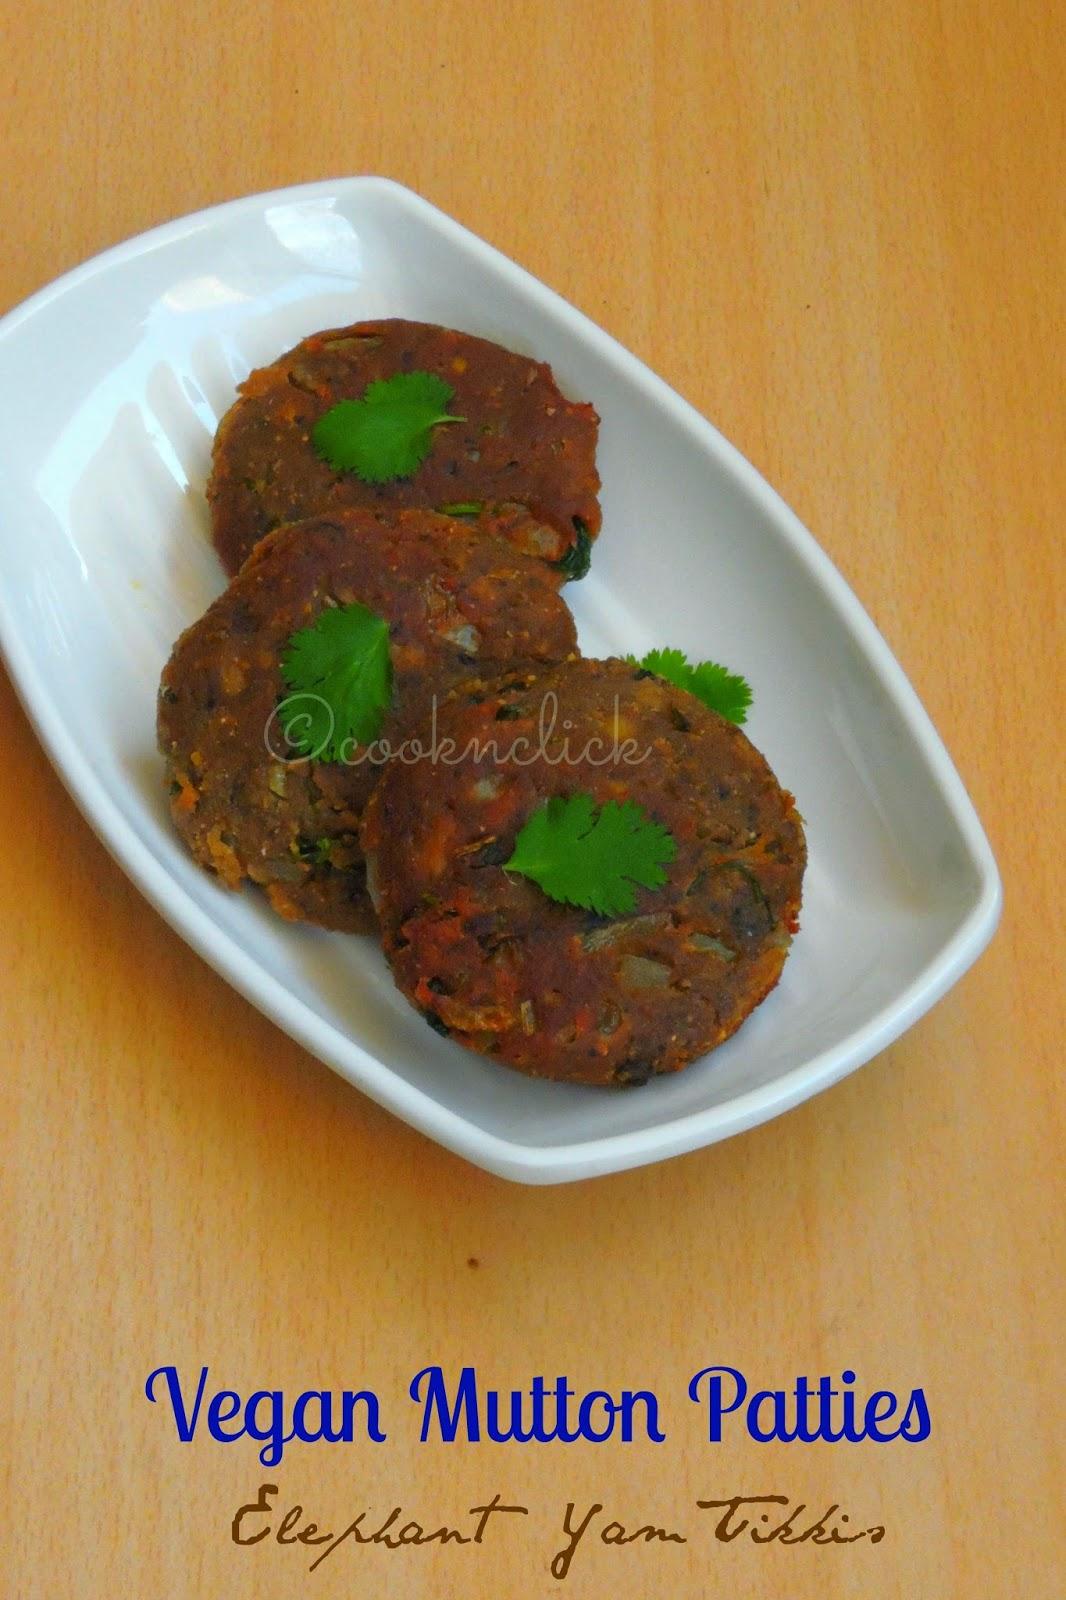 Elephant yam tikkis, karunai kizhangu cutlets, Vegan Mutton patties